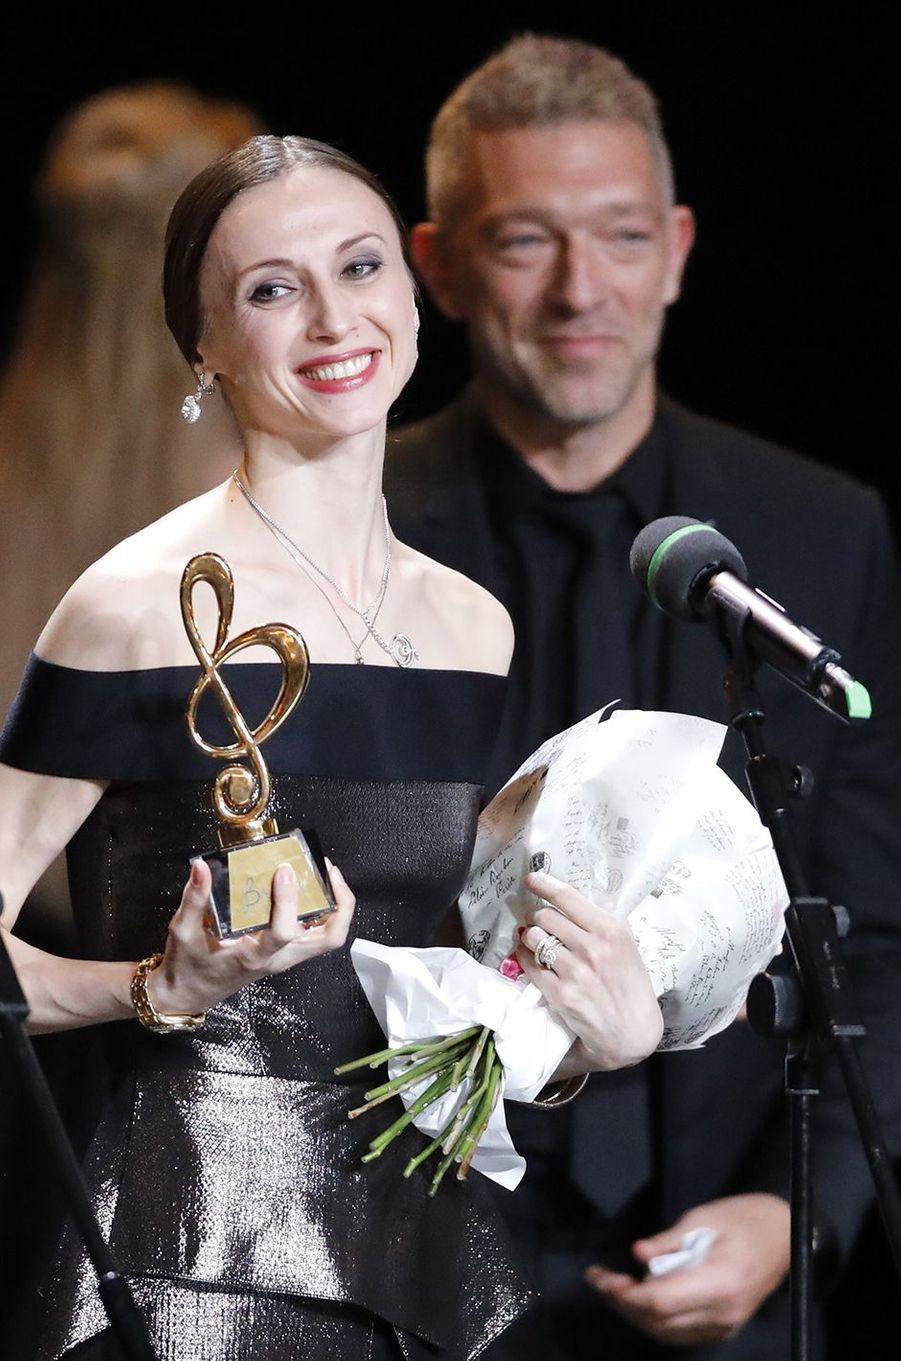 Vincent Cassel remet un prix àSvetlana Zakharova au Bolchoï, le 11 mars 2018.